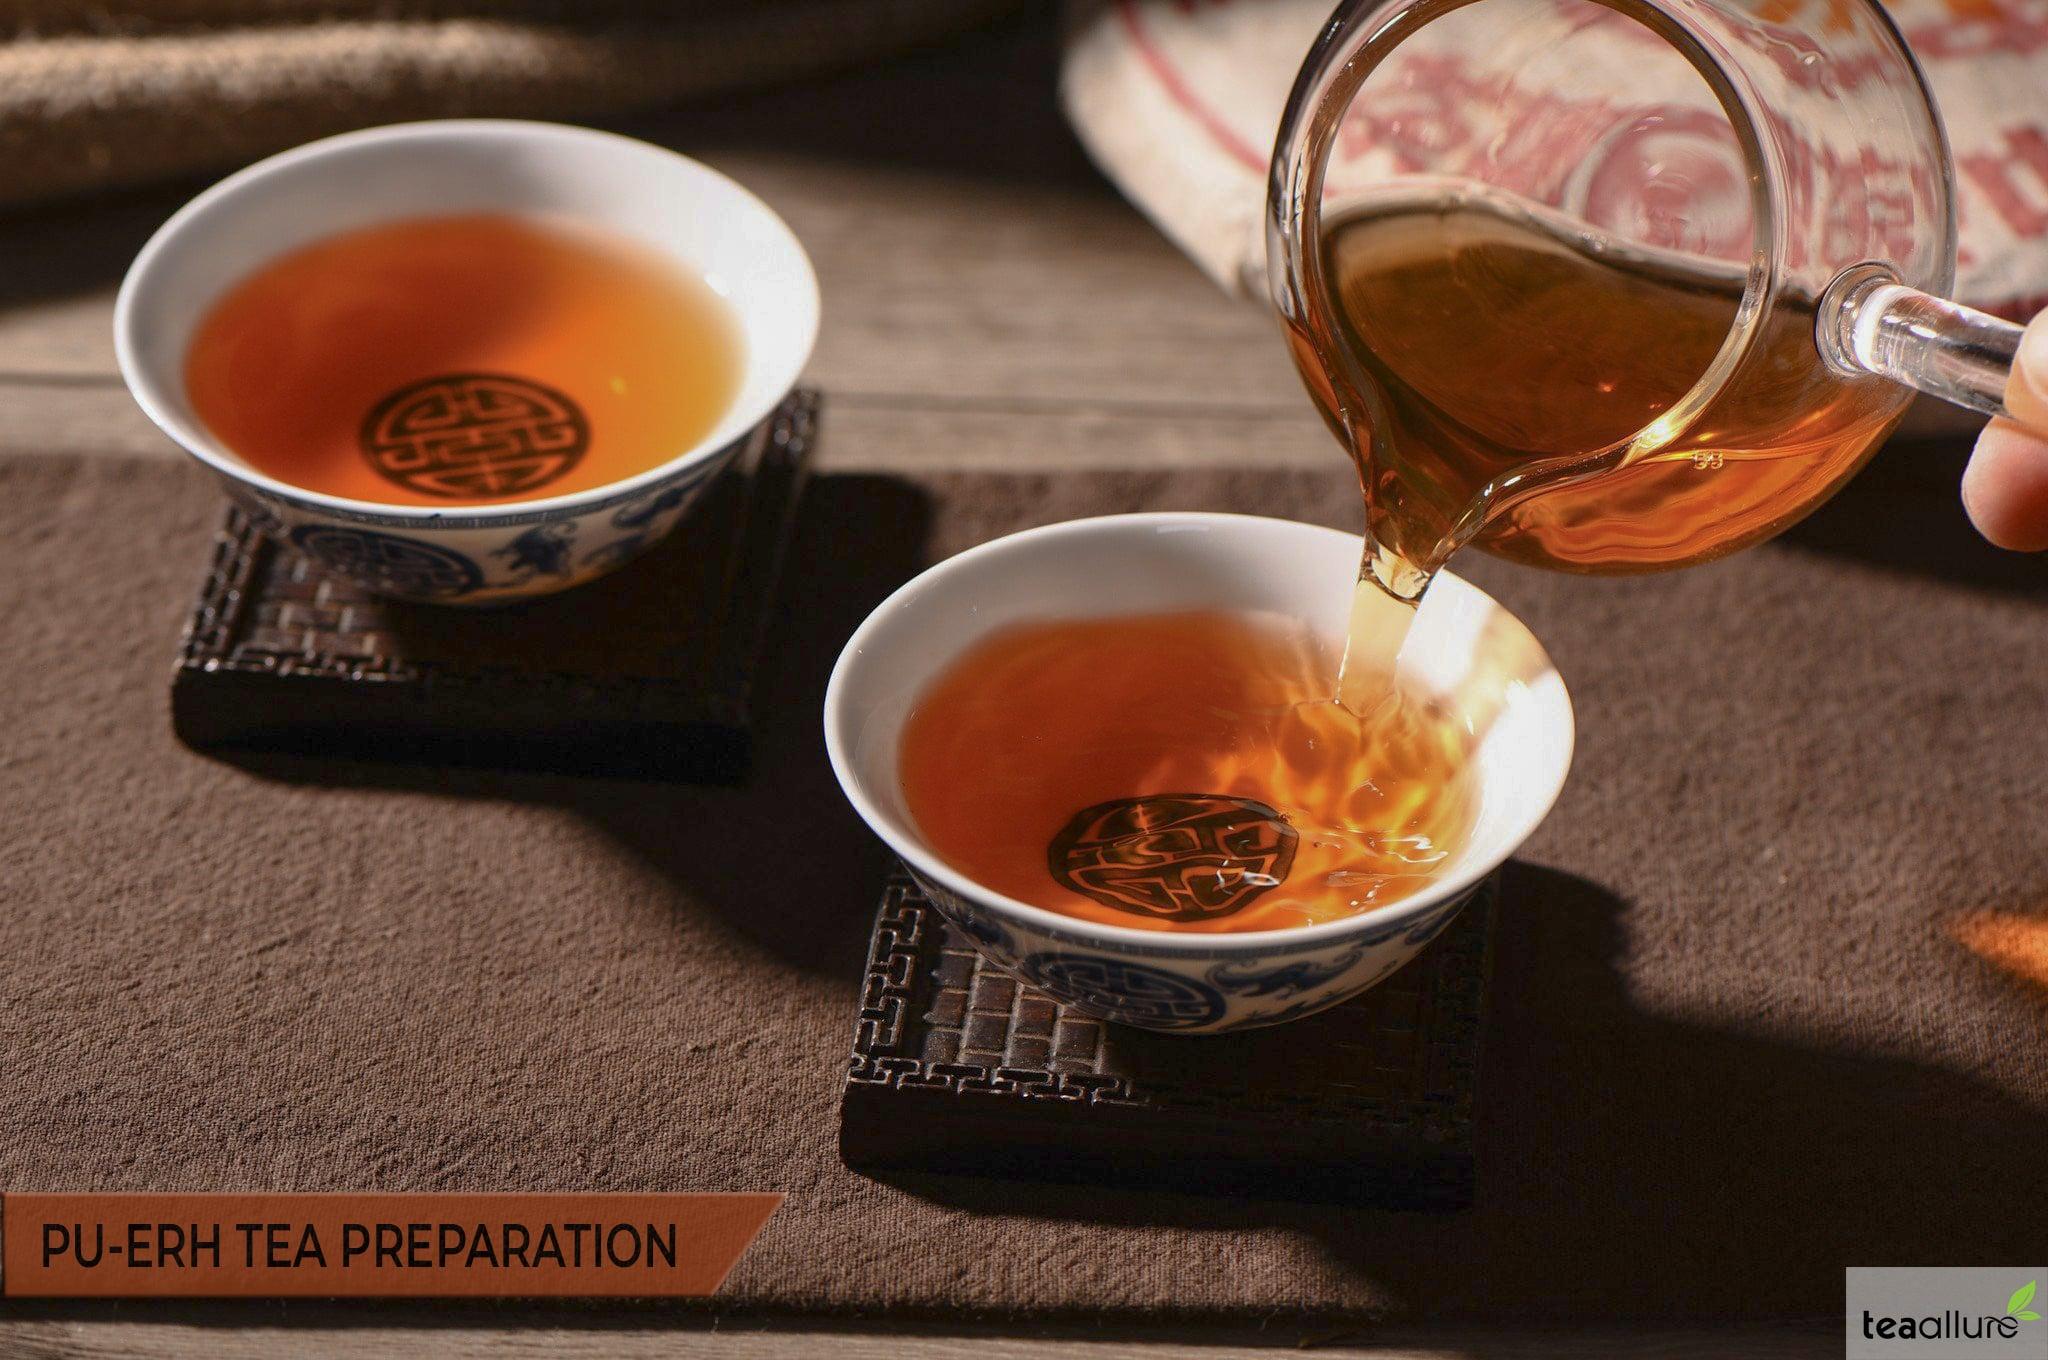 How to brew Pu-erh Tea: Preparation and Consummation